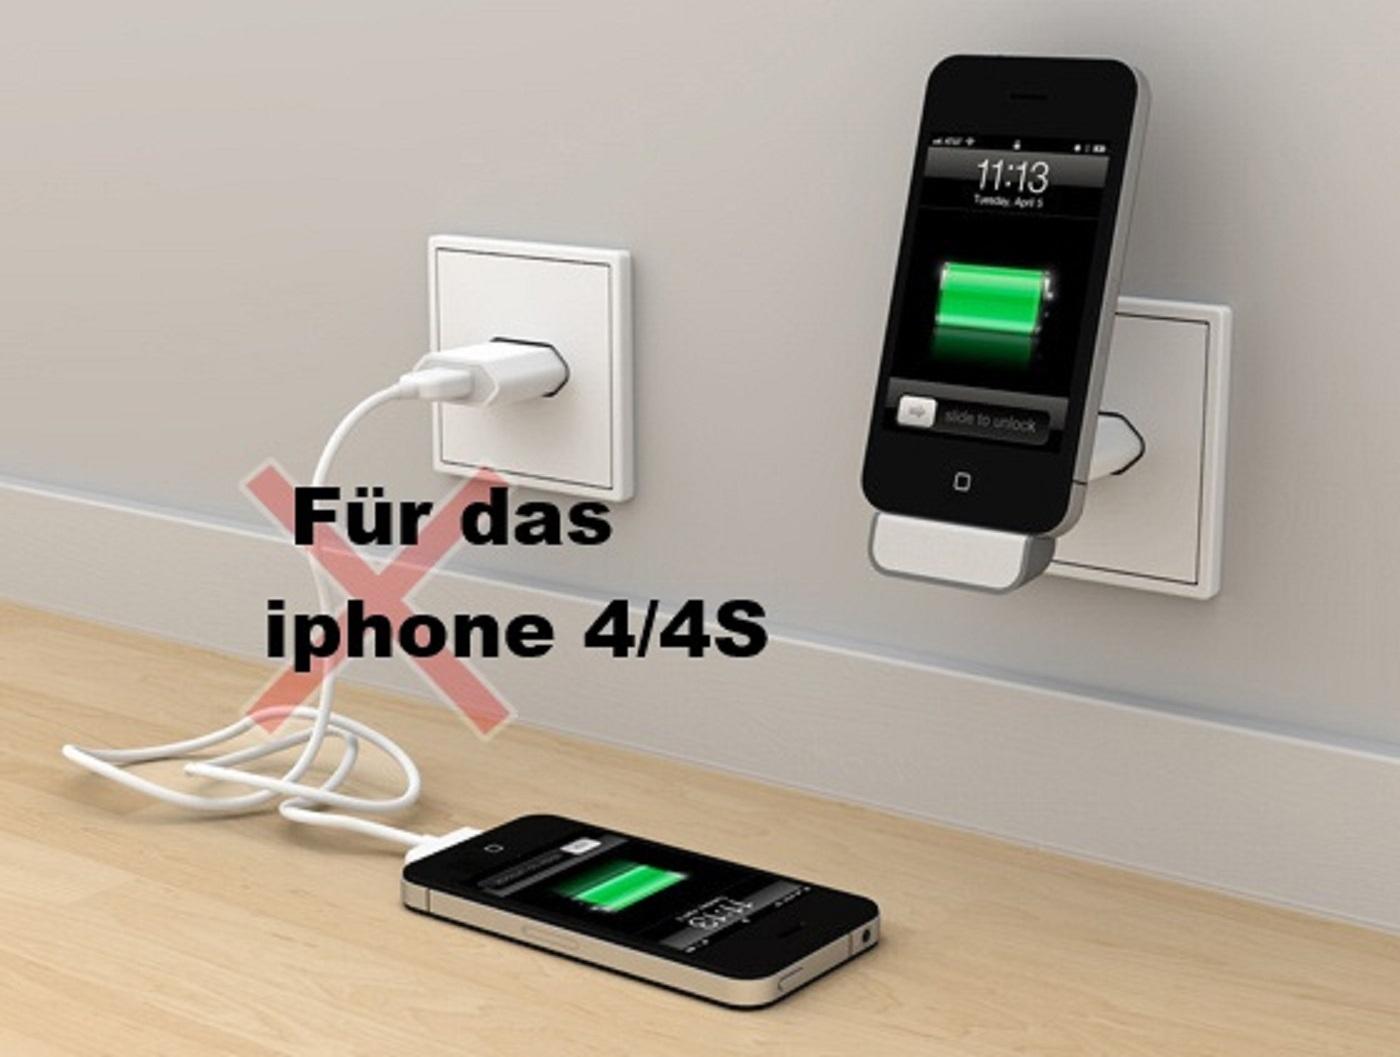 dockingstation 3 3g ladeger t ladestation ladekabel iphone ipod idock walldock kaufen bei. Black Bedroom Furniture Sets. Home Design Ideas